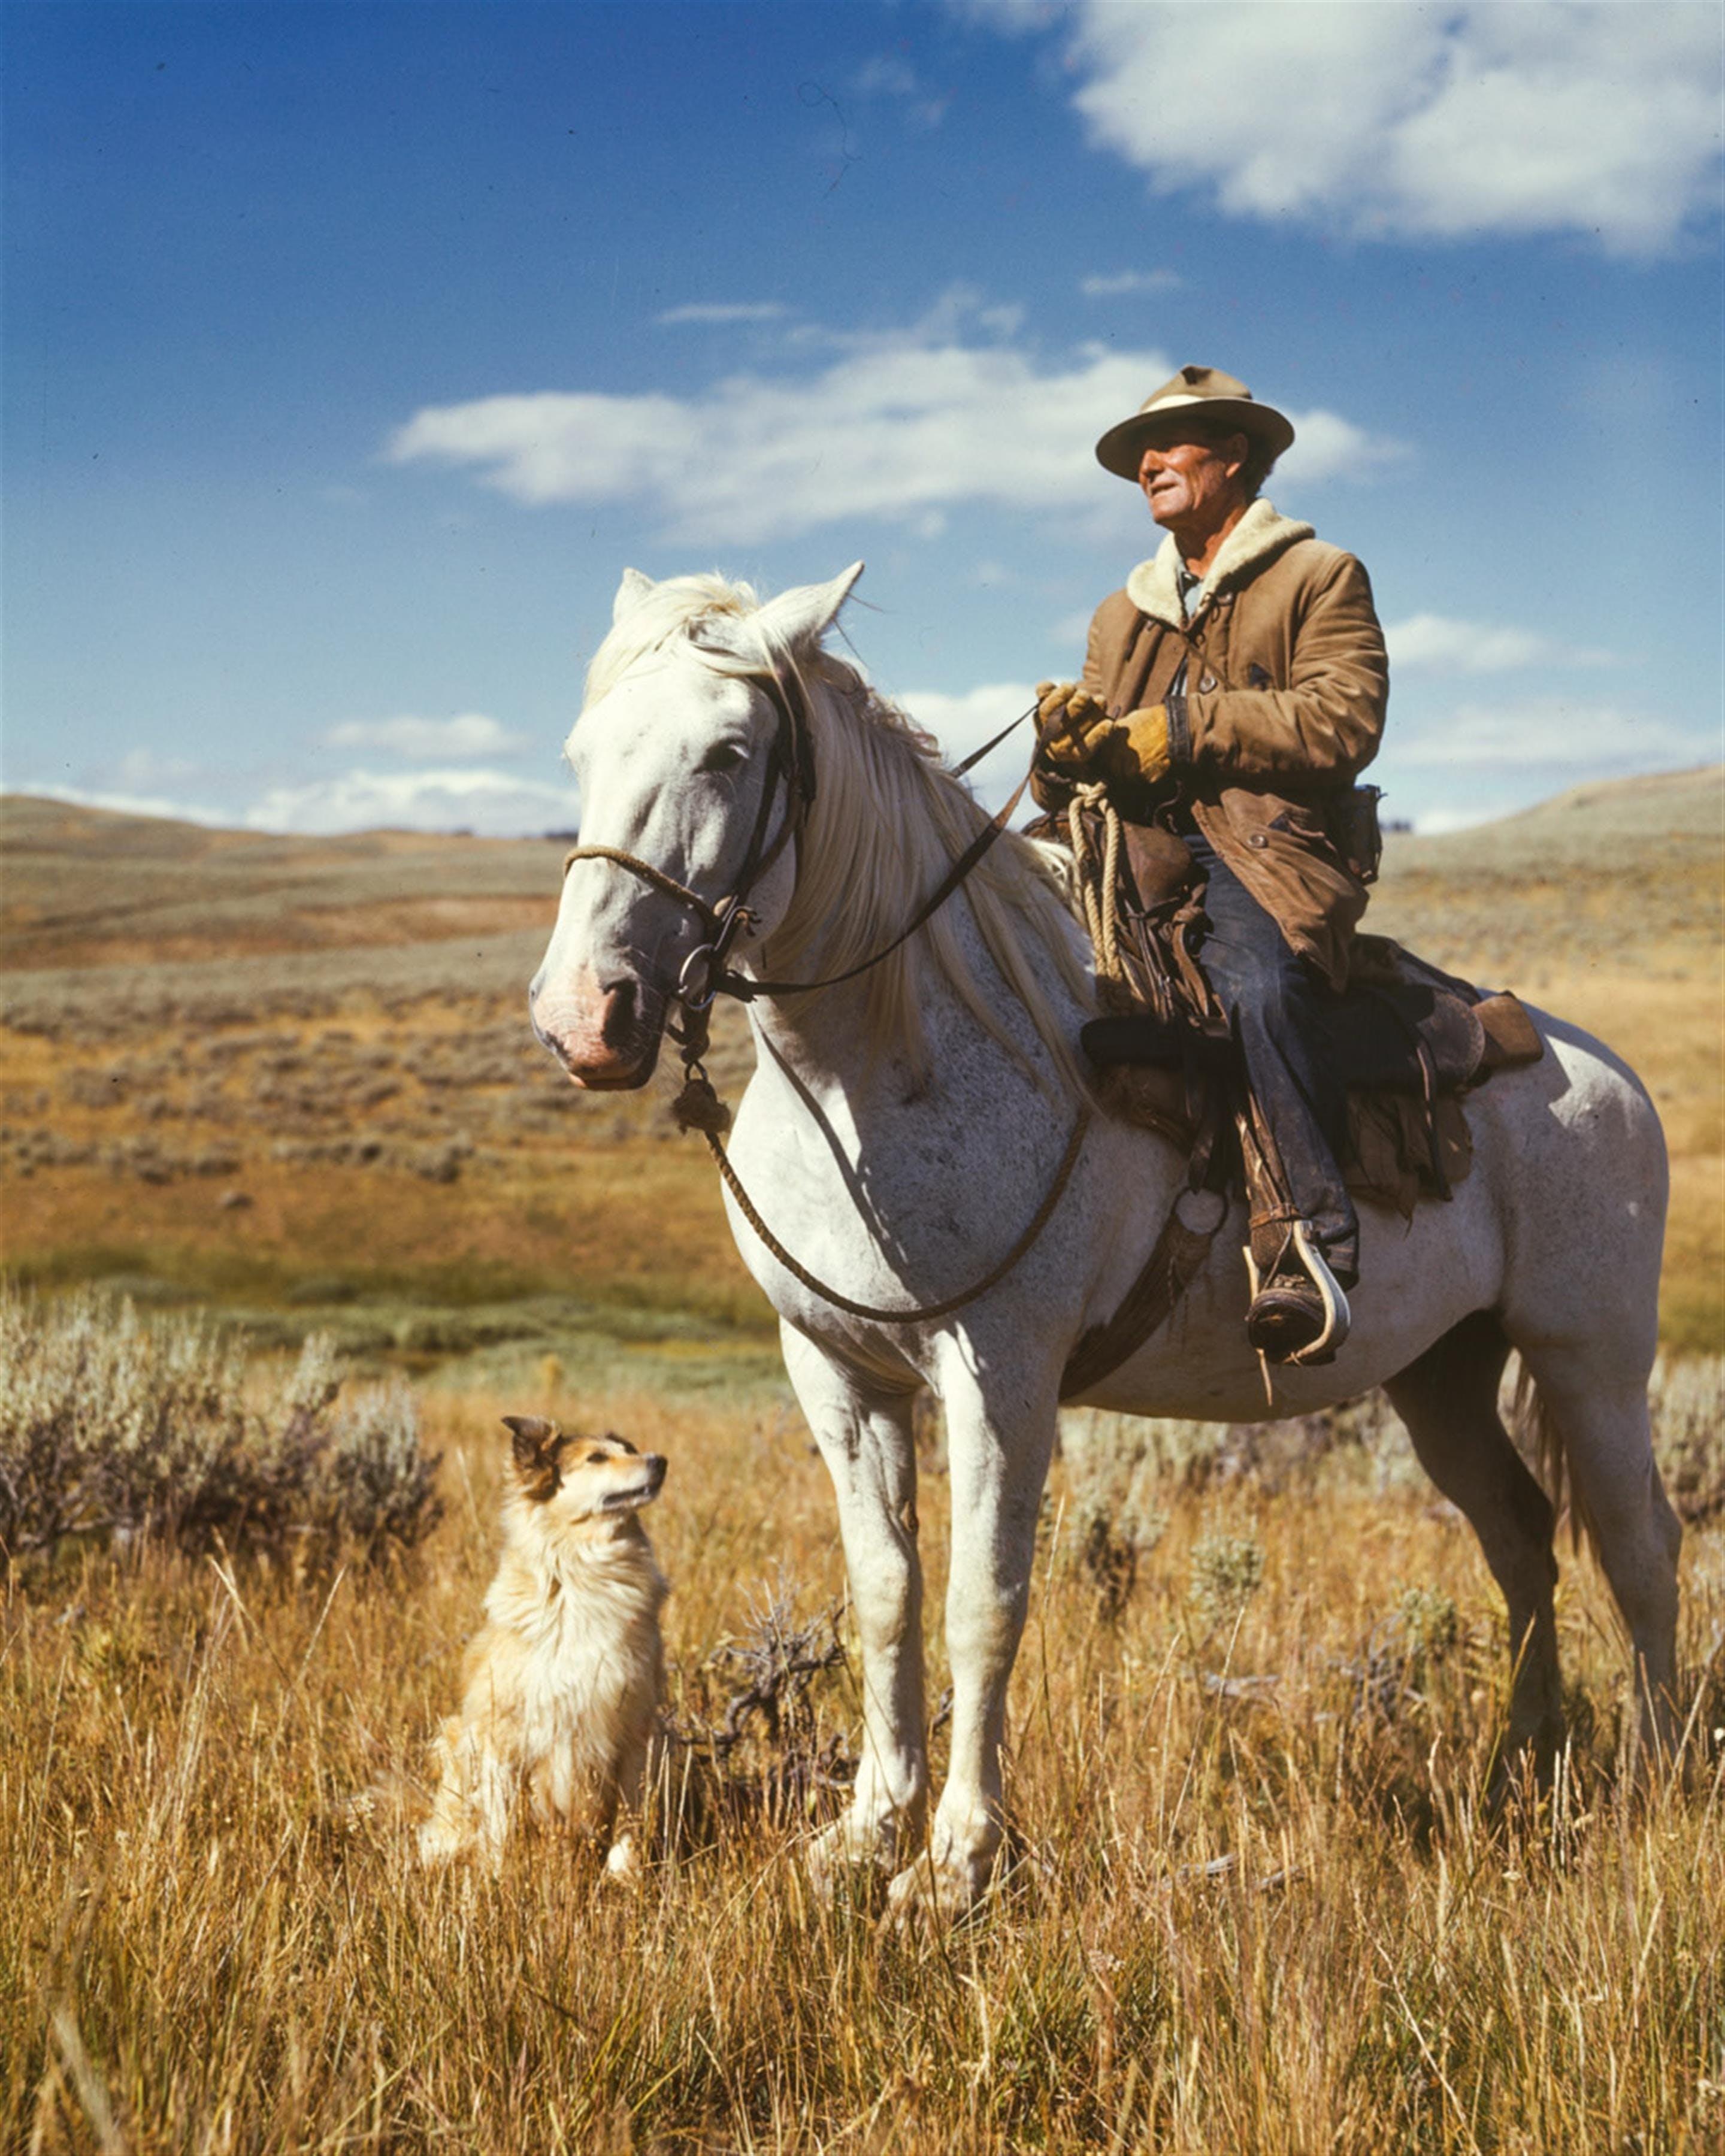 Man on White Horse Next to Dog on Grassy Field